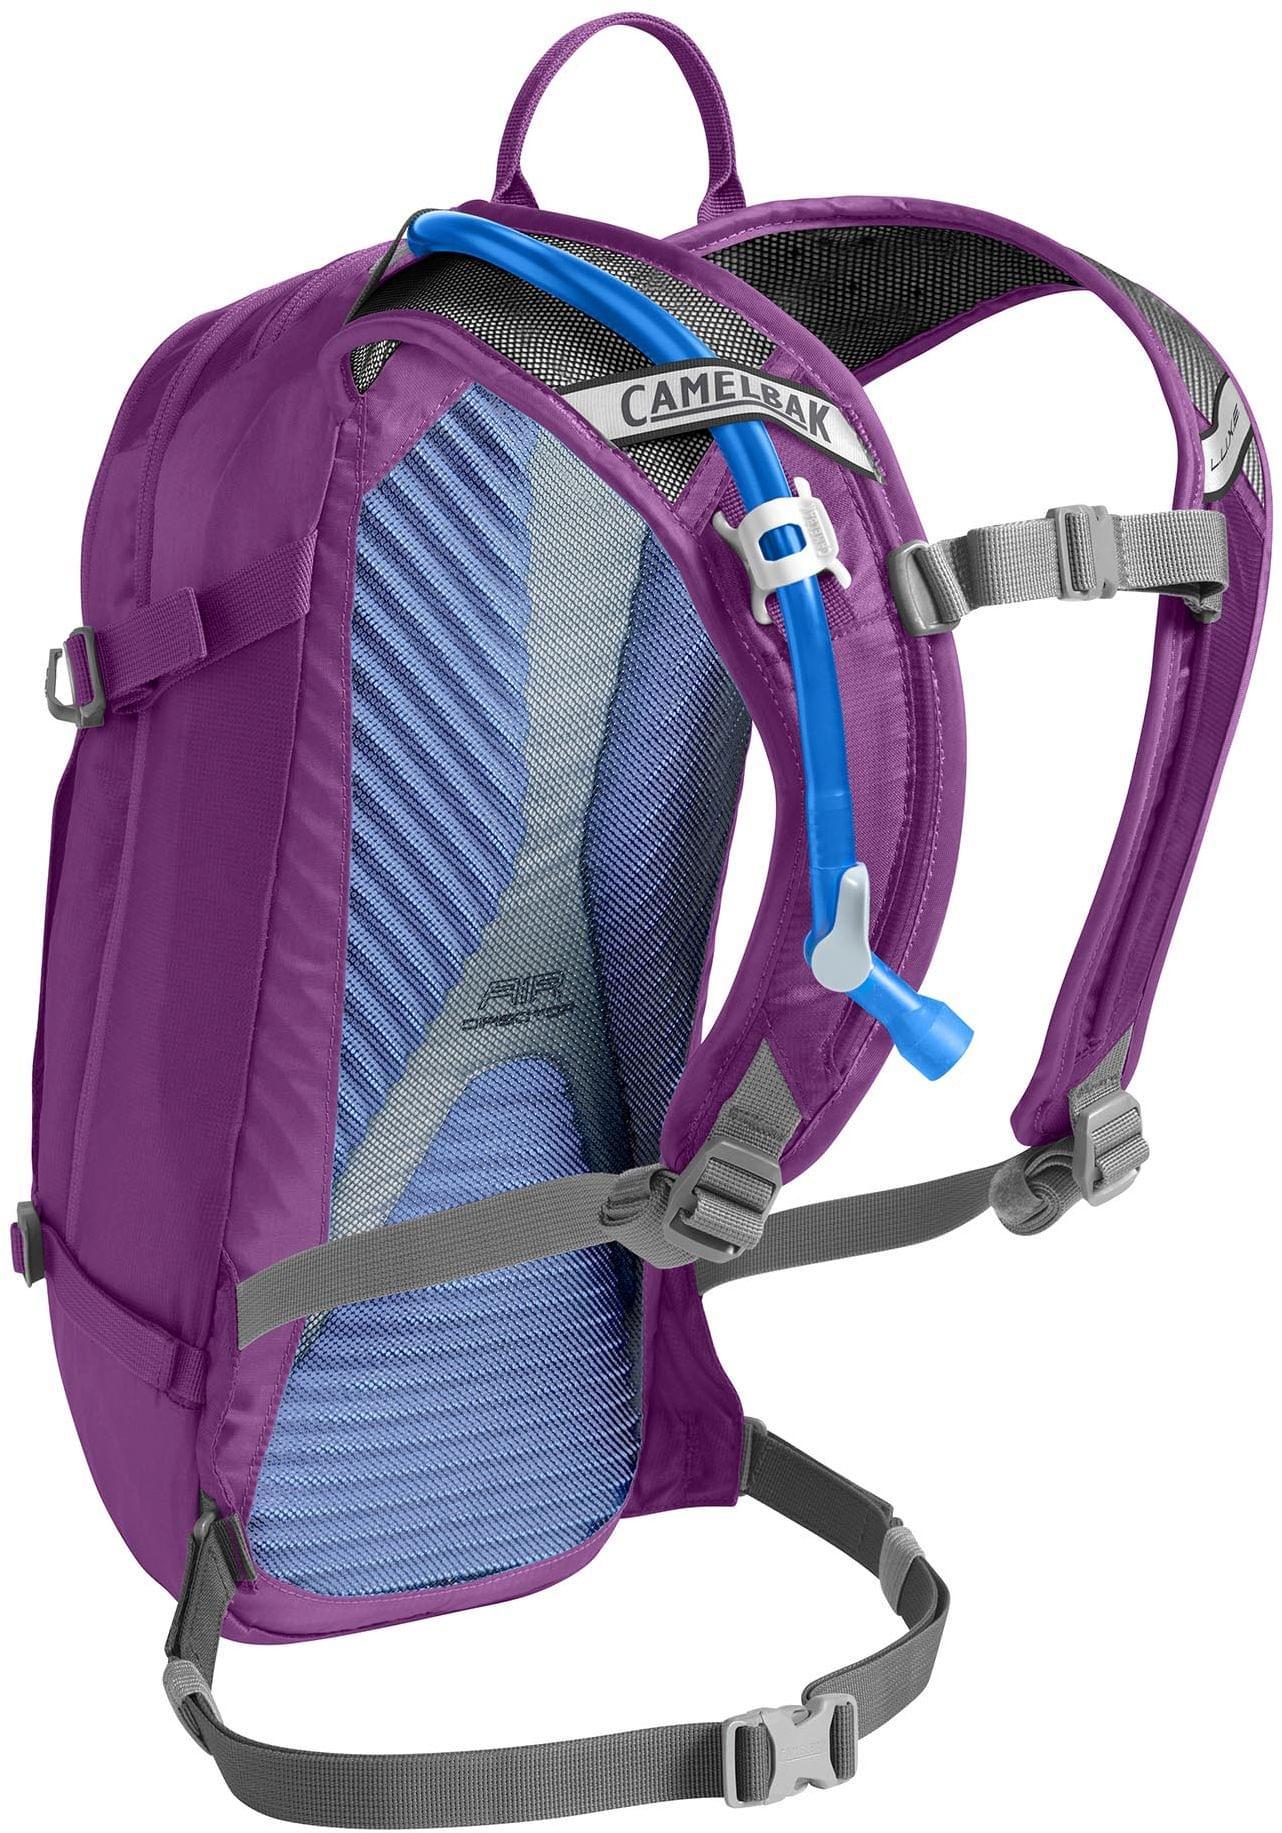 Dámský cyklistický batoh Camelbak Luxe - Light Purple Charcoal - Ski ... 7b38369c65